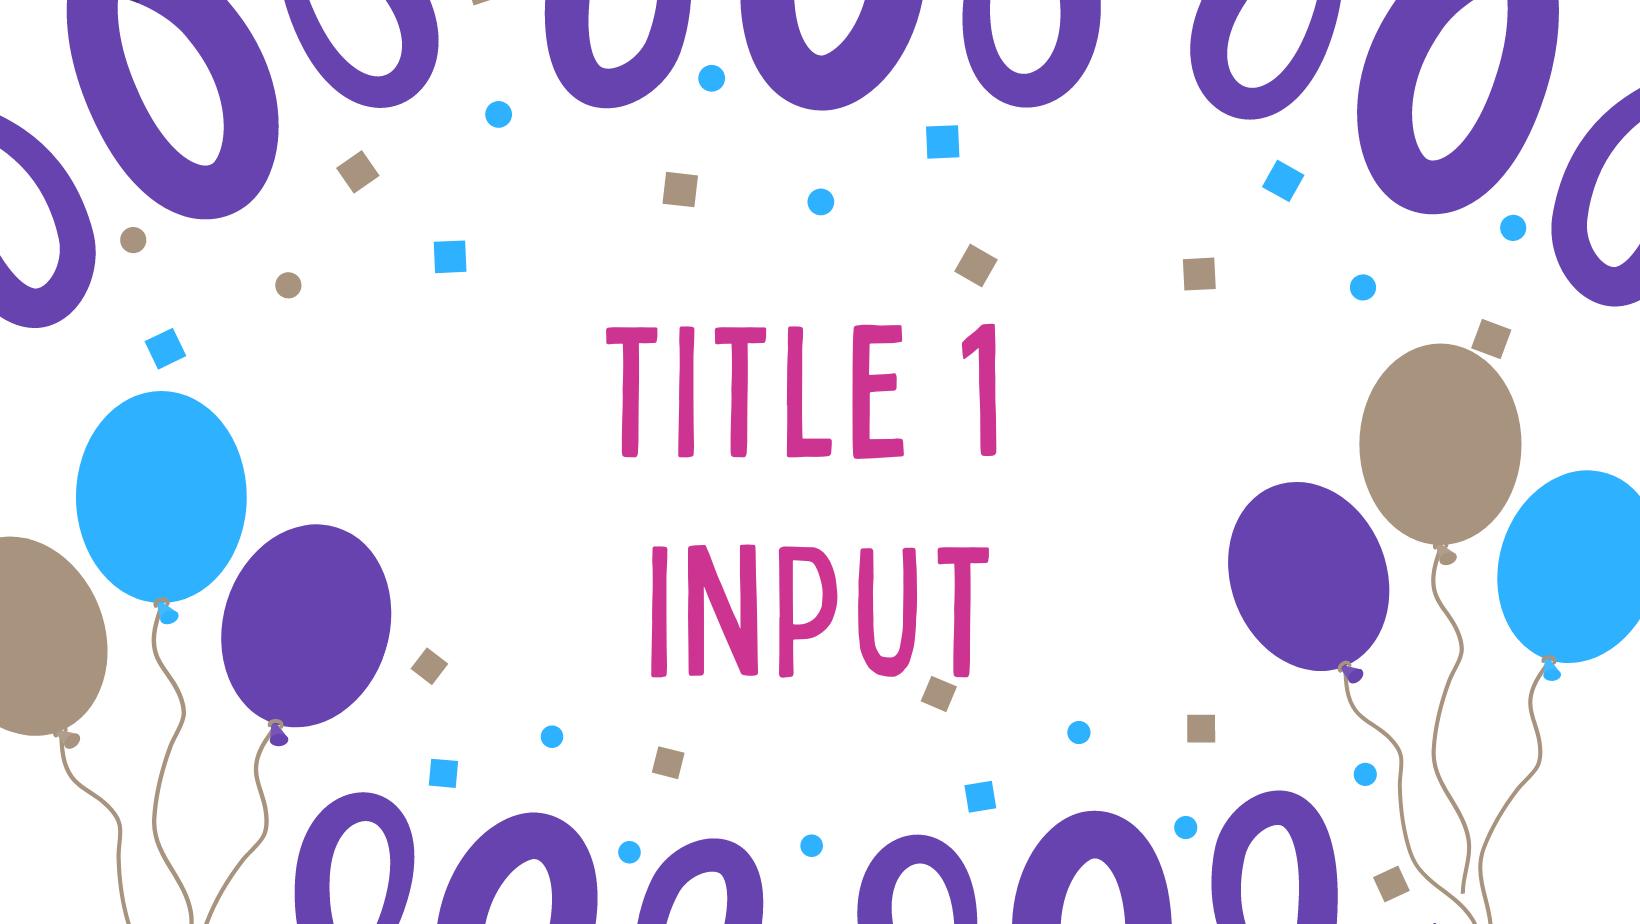 balloons, text: title 1 input